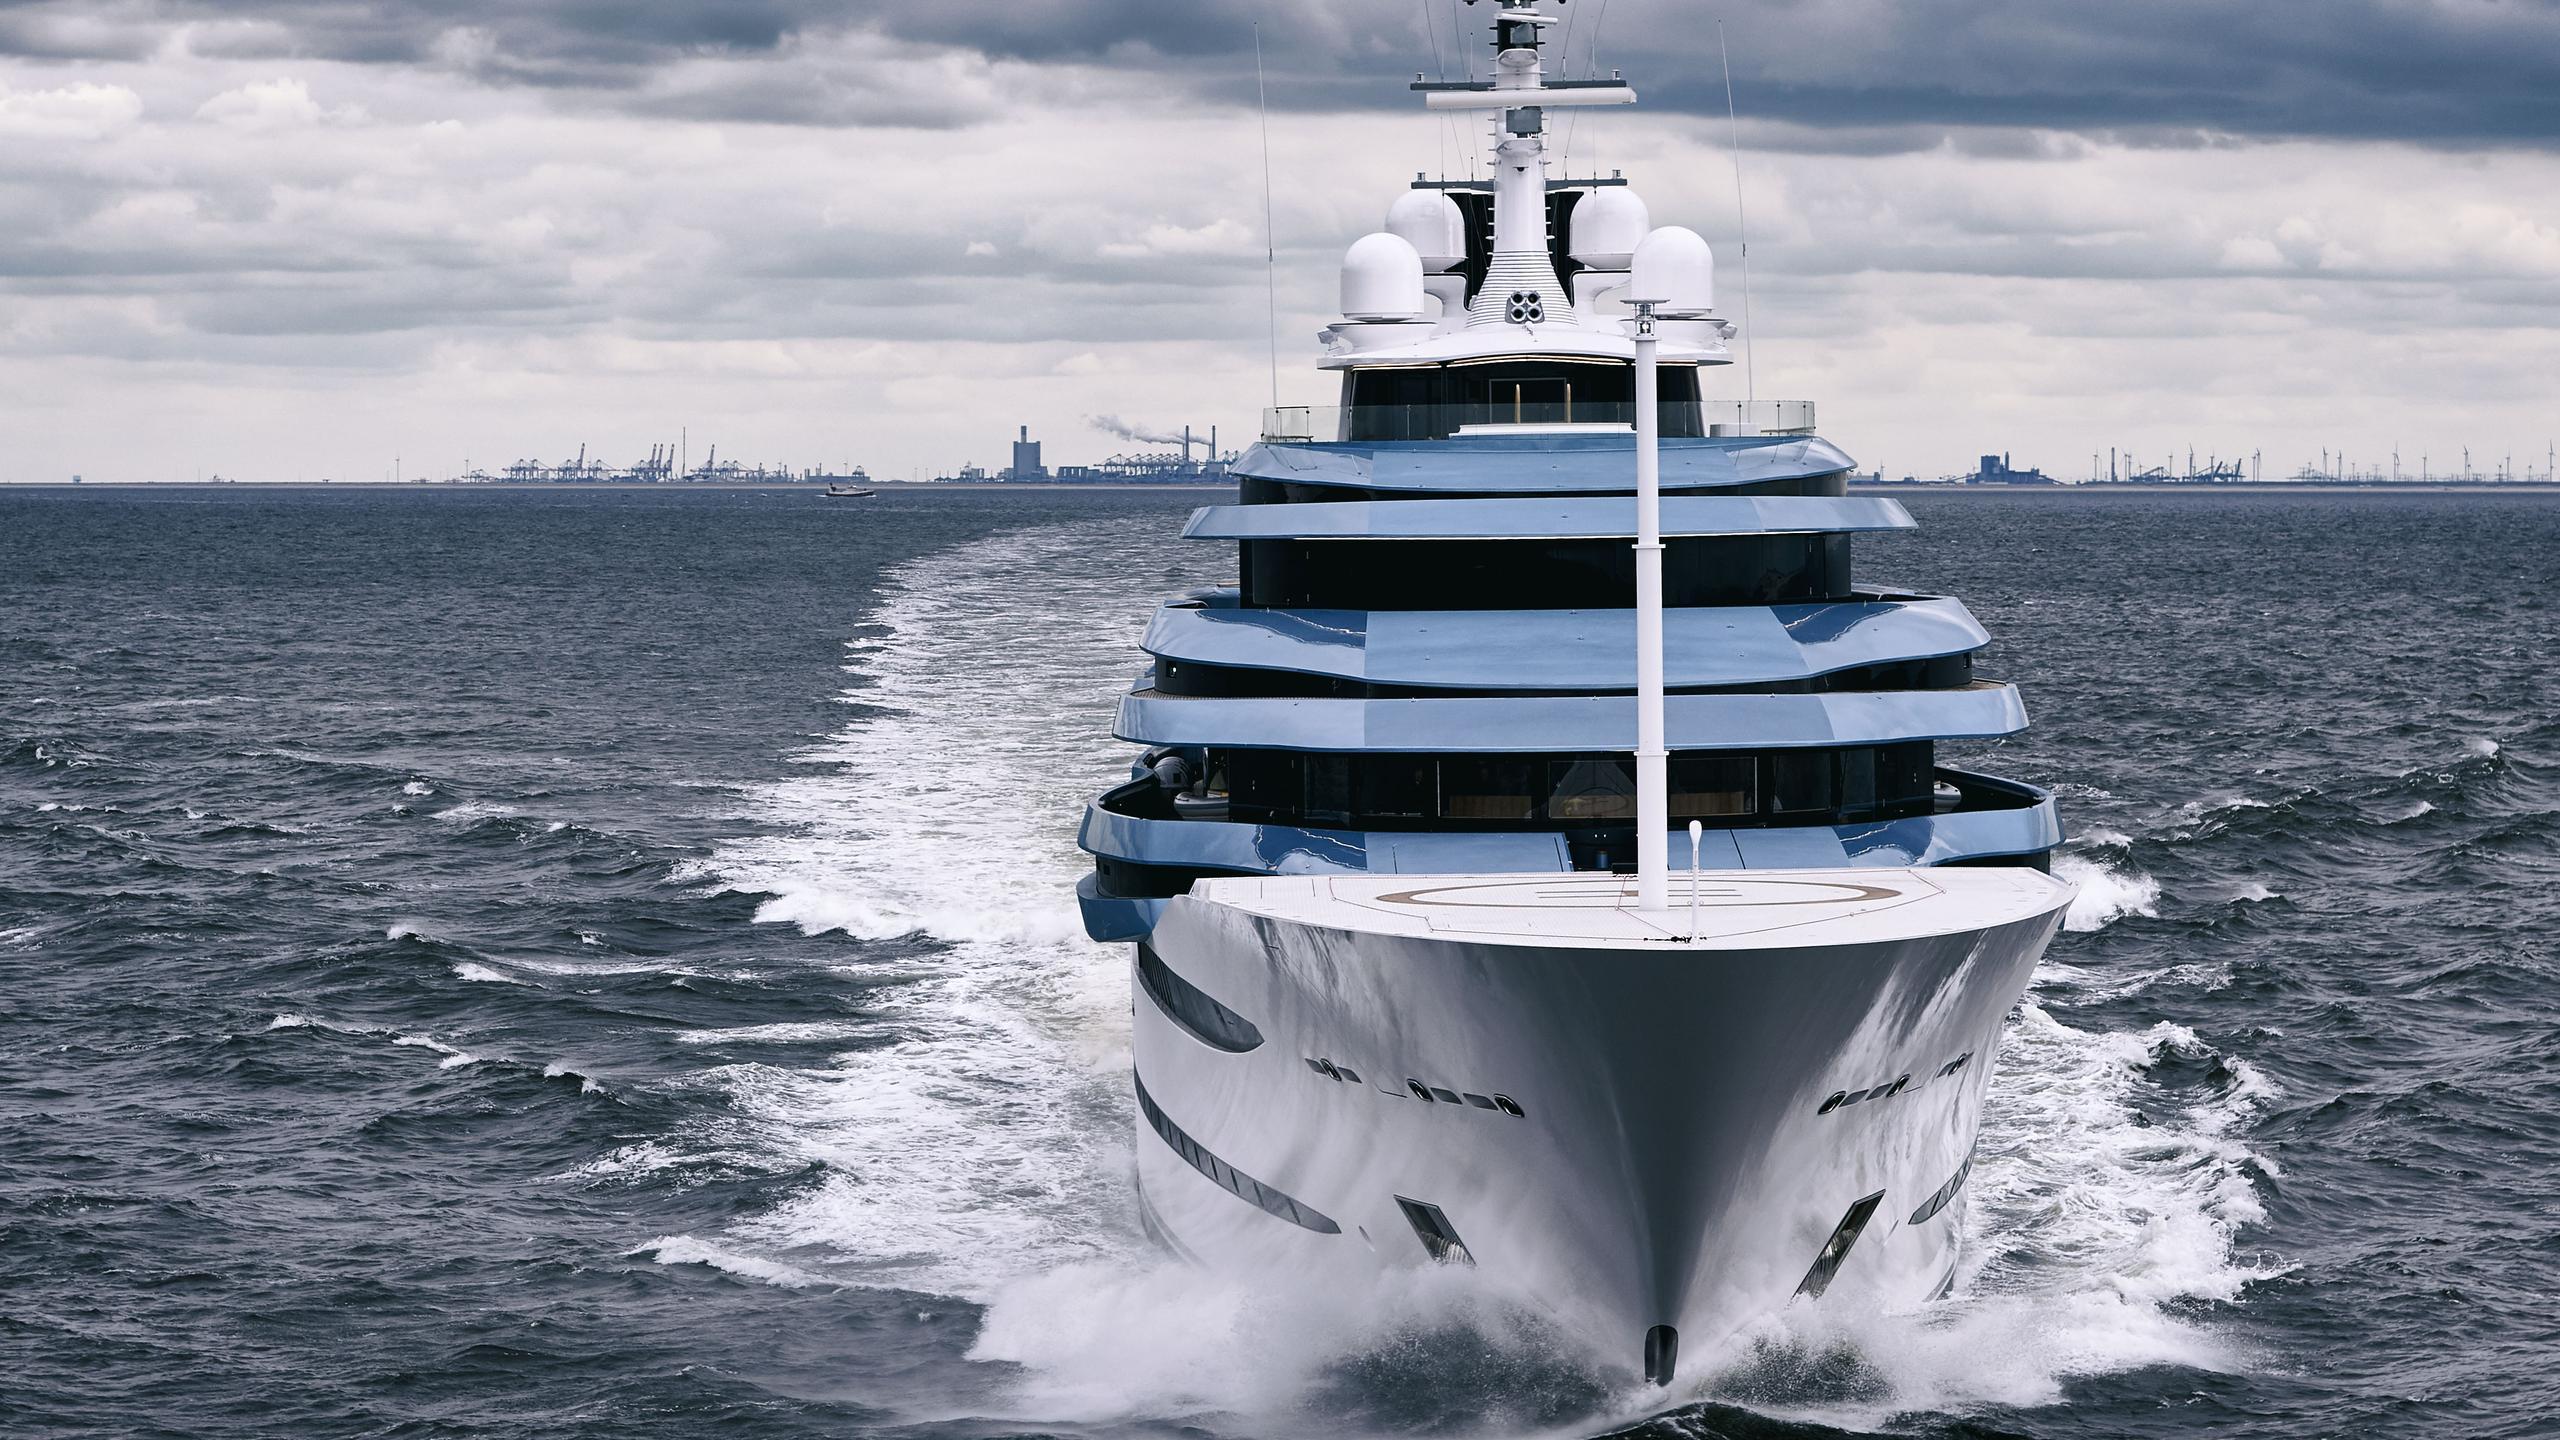 jubilee motoryacht oceanco y714 110m 2017 bow